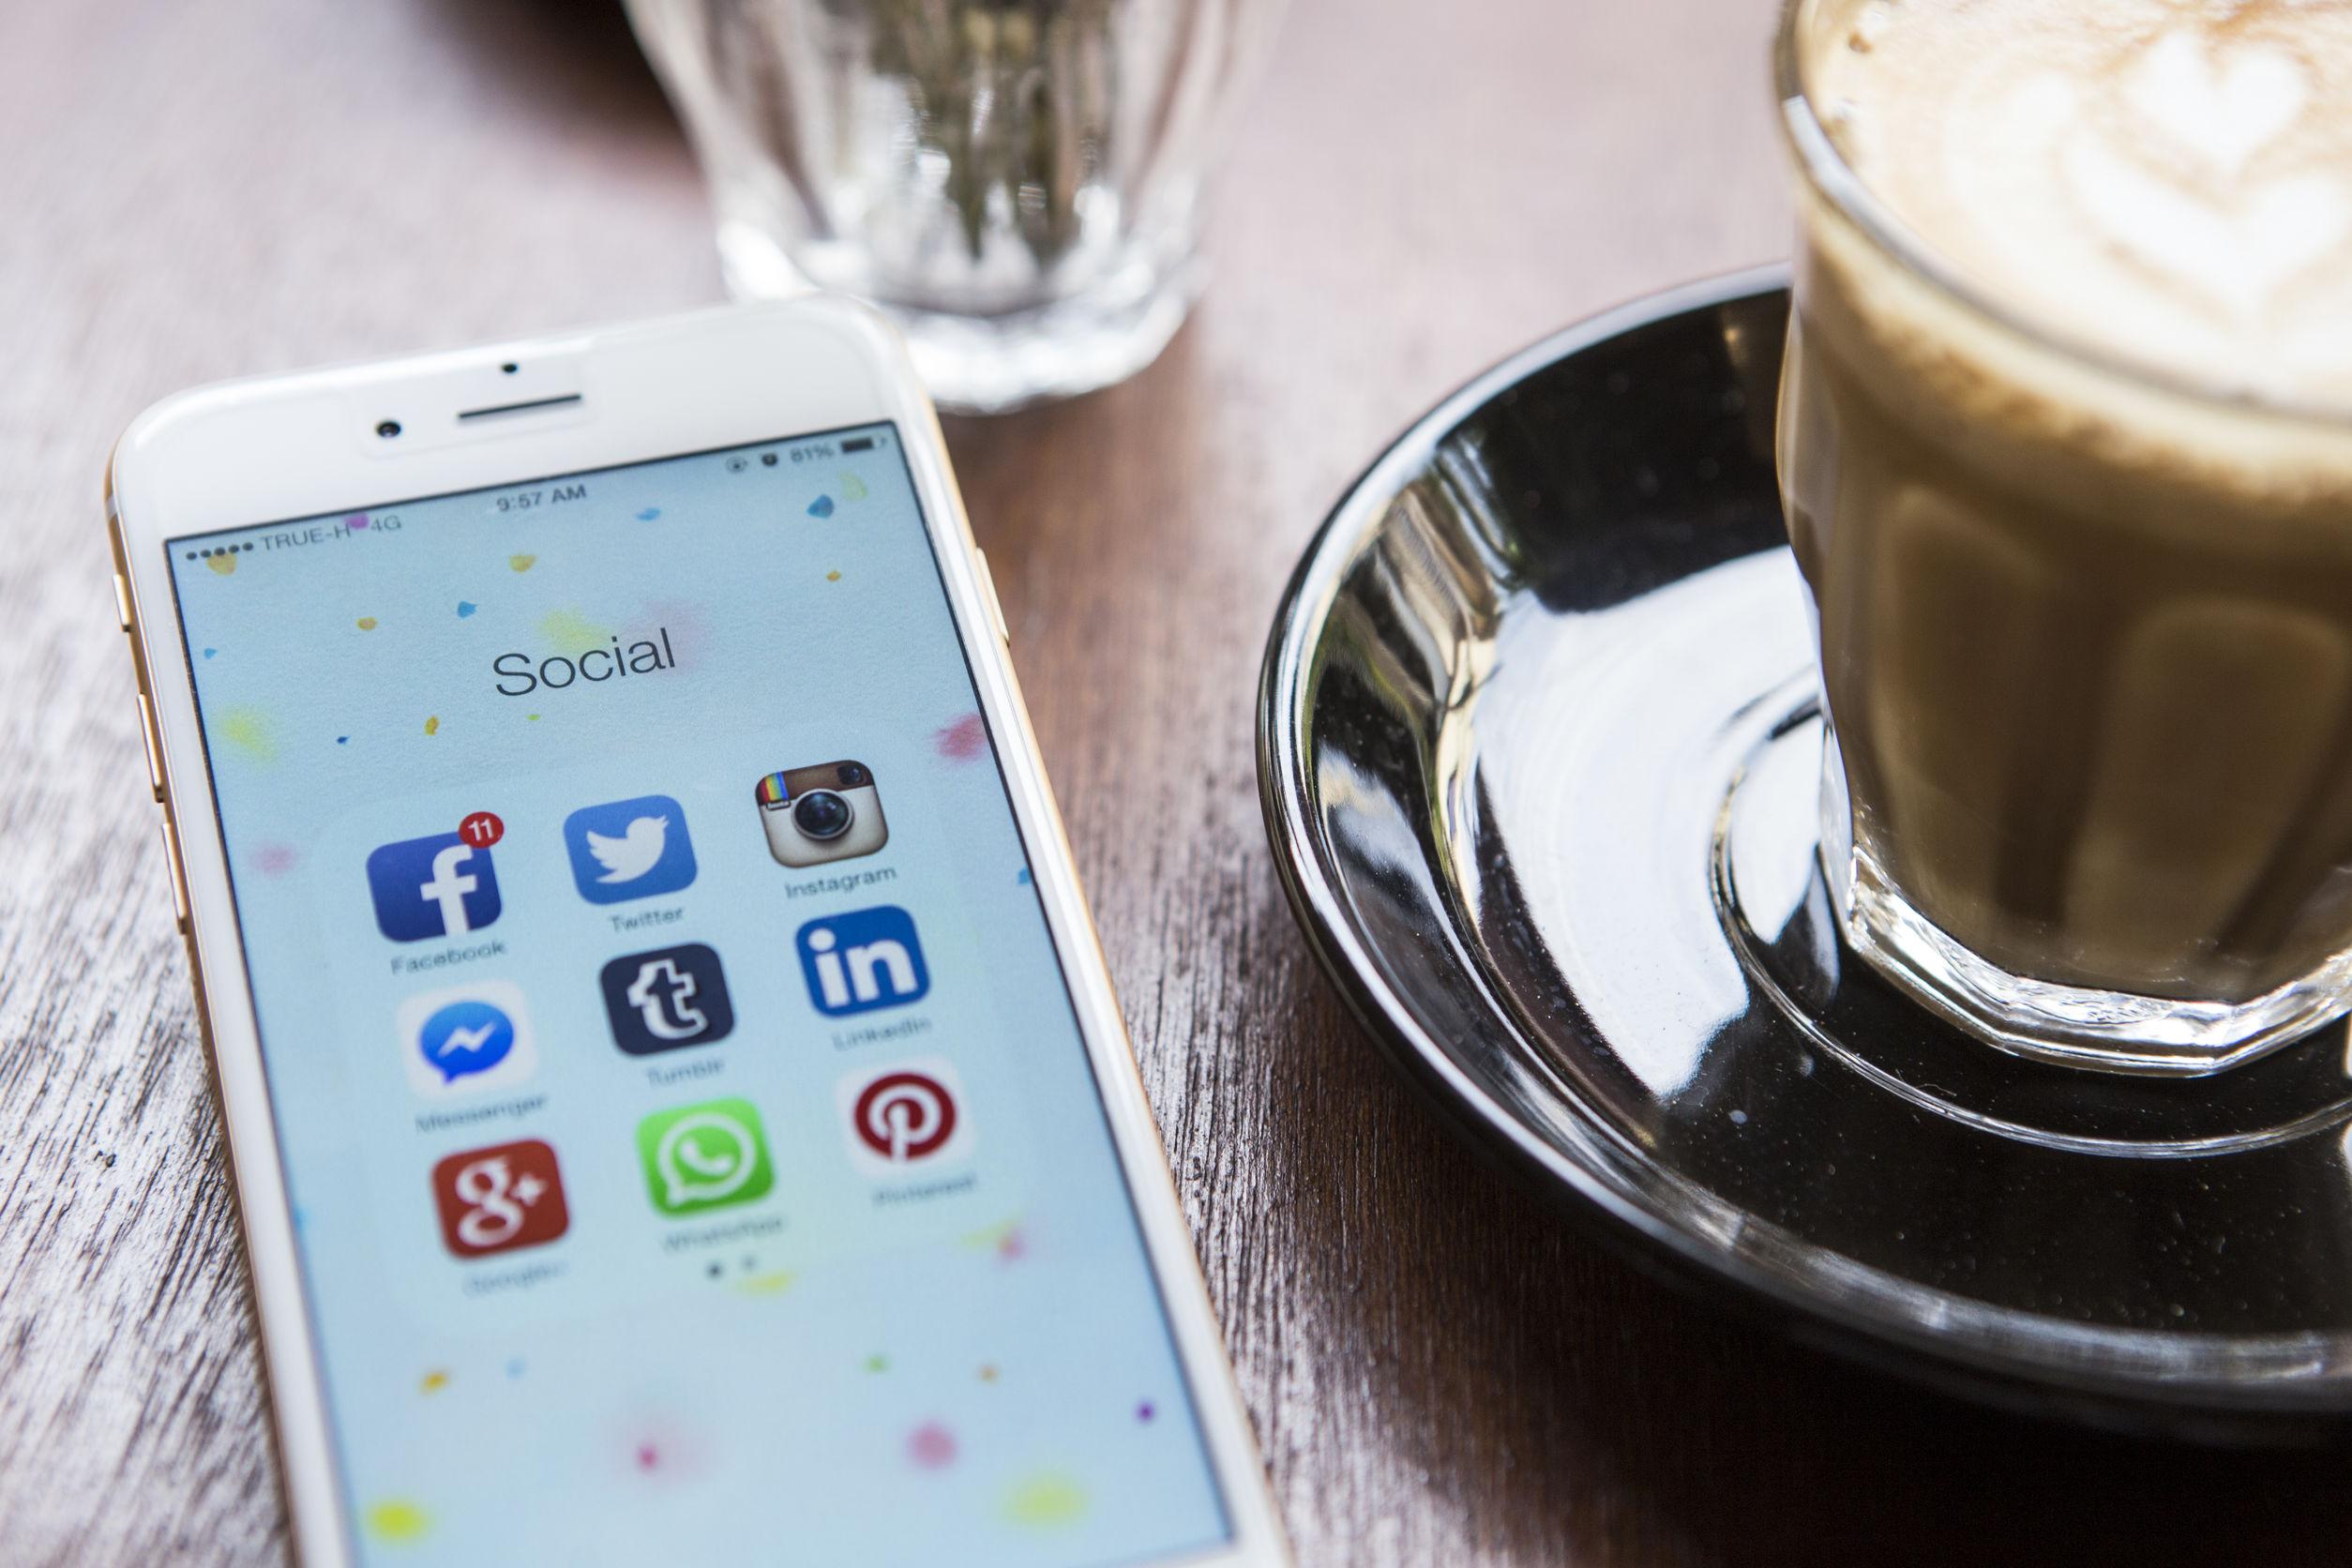 Sozial media Beziehung